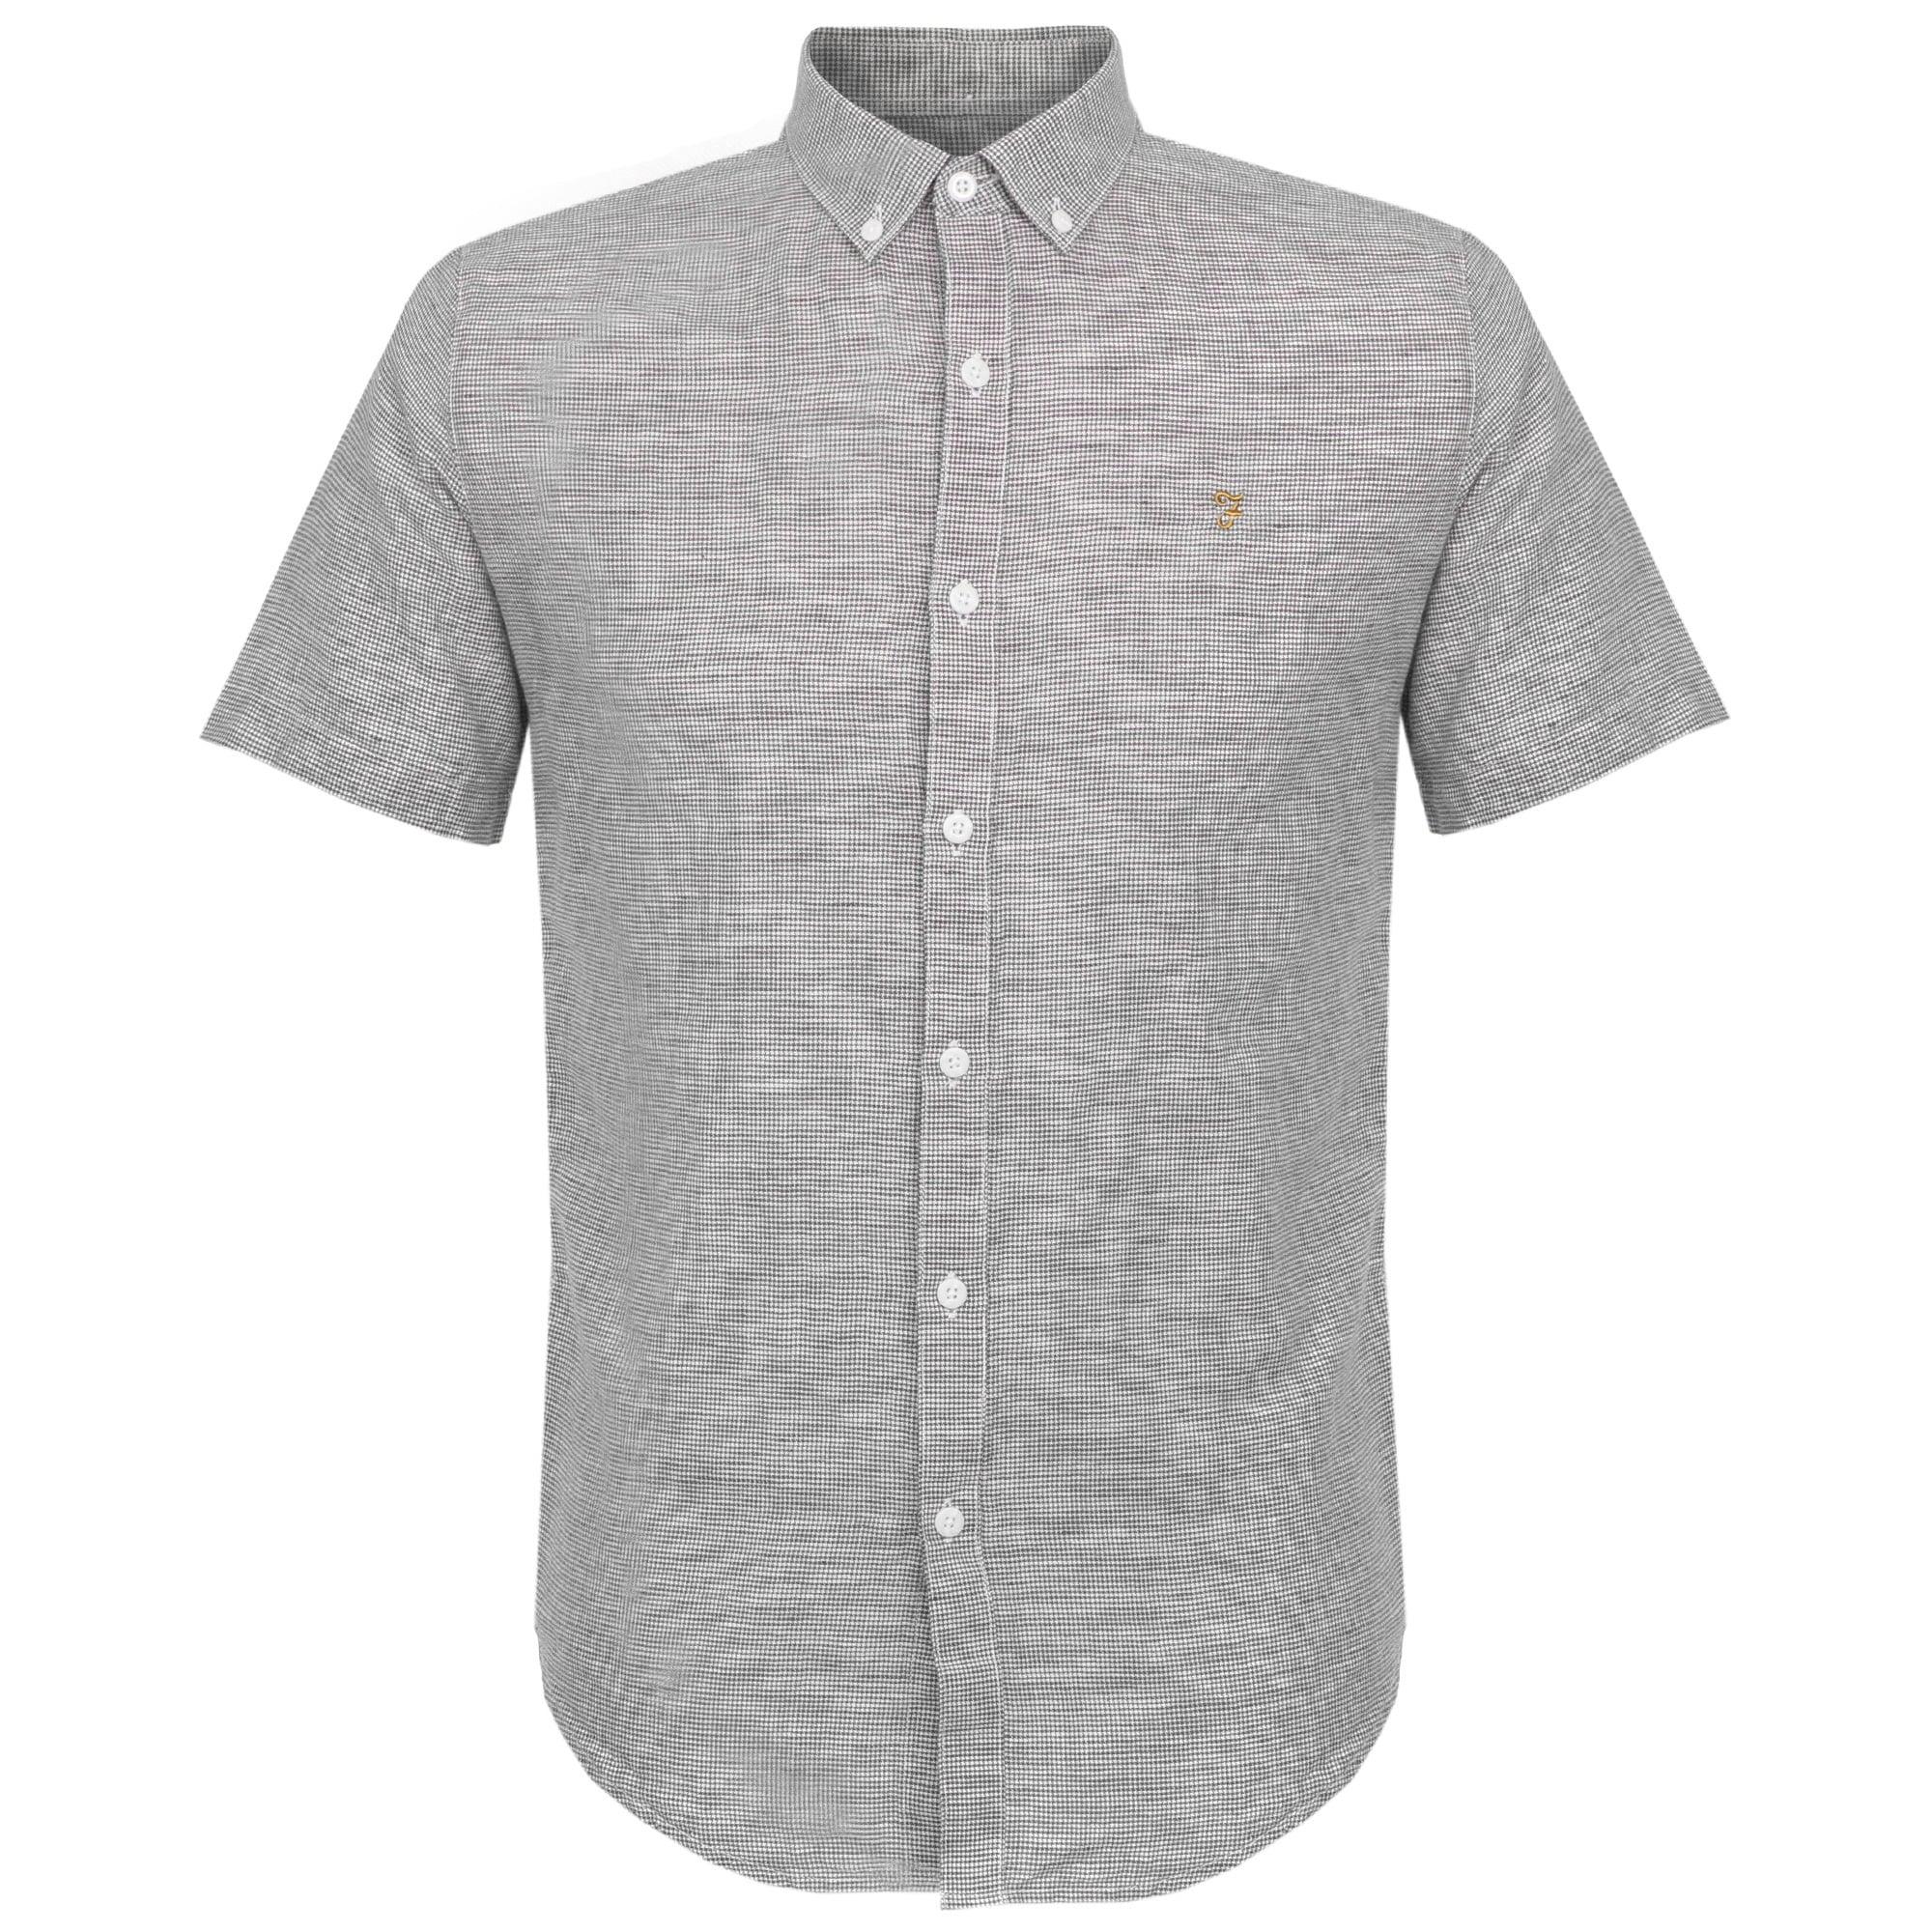 Farah Telford Slim True Navy Shirt F4WS7024 1a9c08932